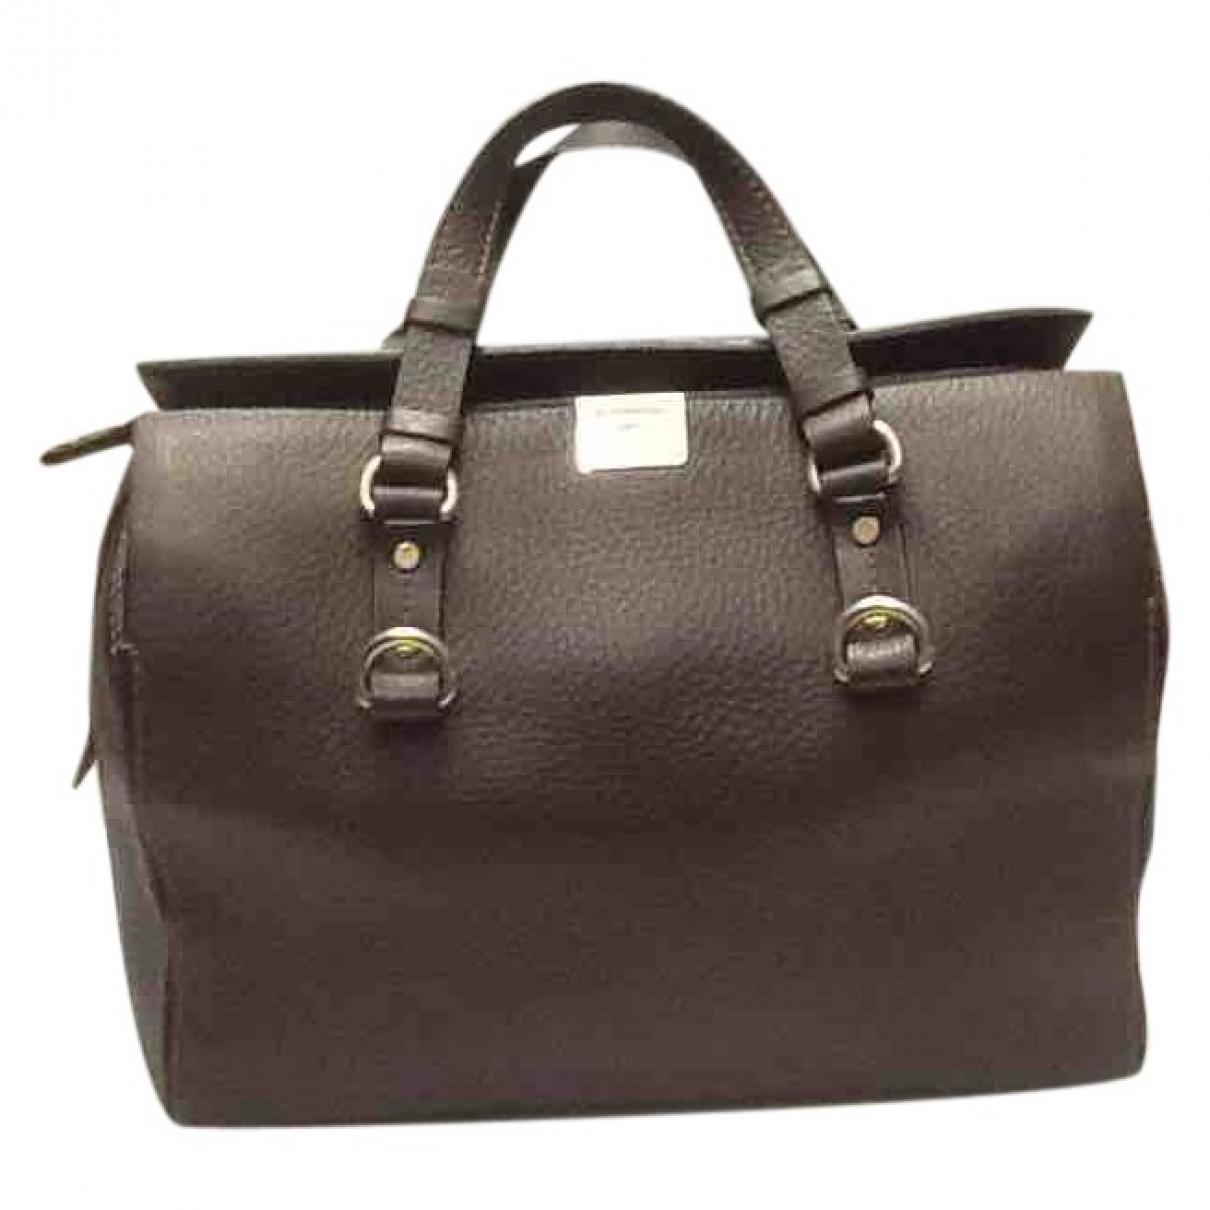 Dsquared2 \N Brown Leather handbag for Women \N